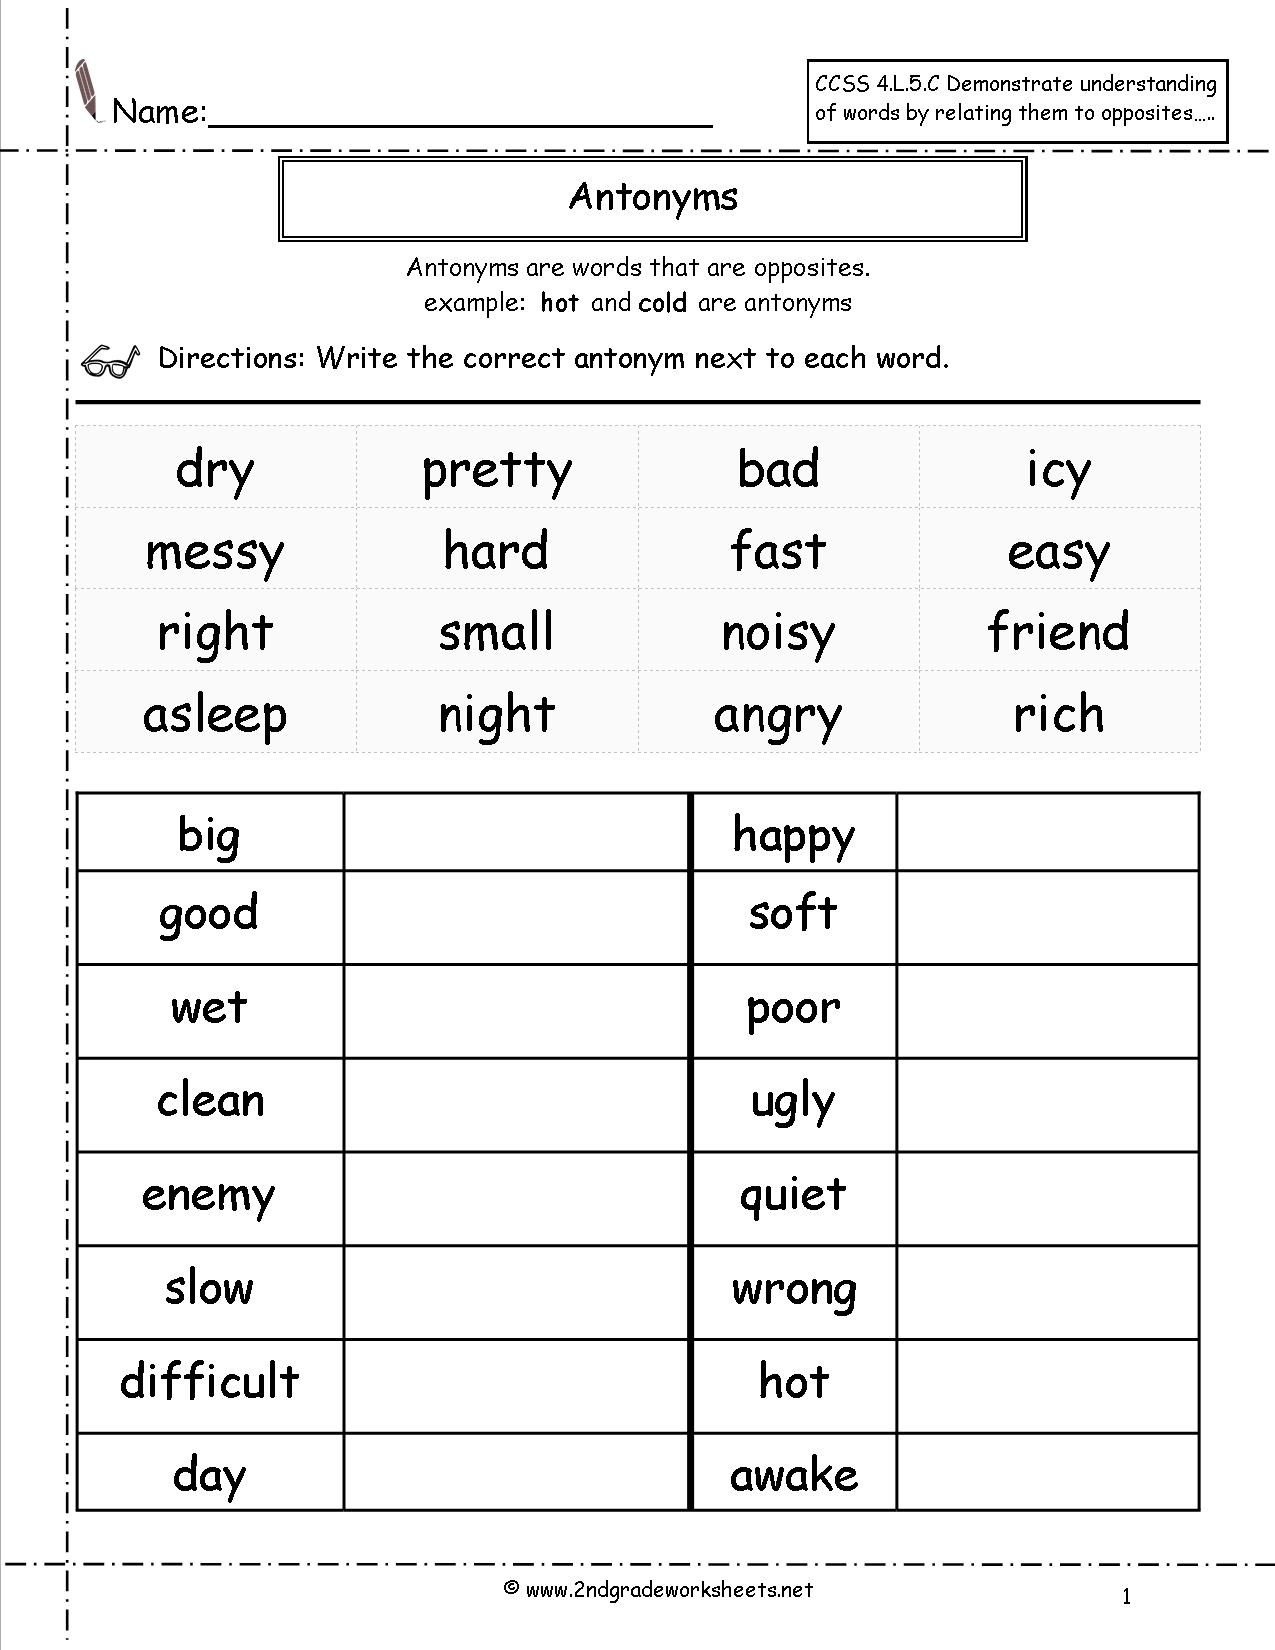 Free Language/grammar Worksheets And Printouts | 2Nd Grade Language Arts Worksheets Free Printables